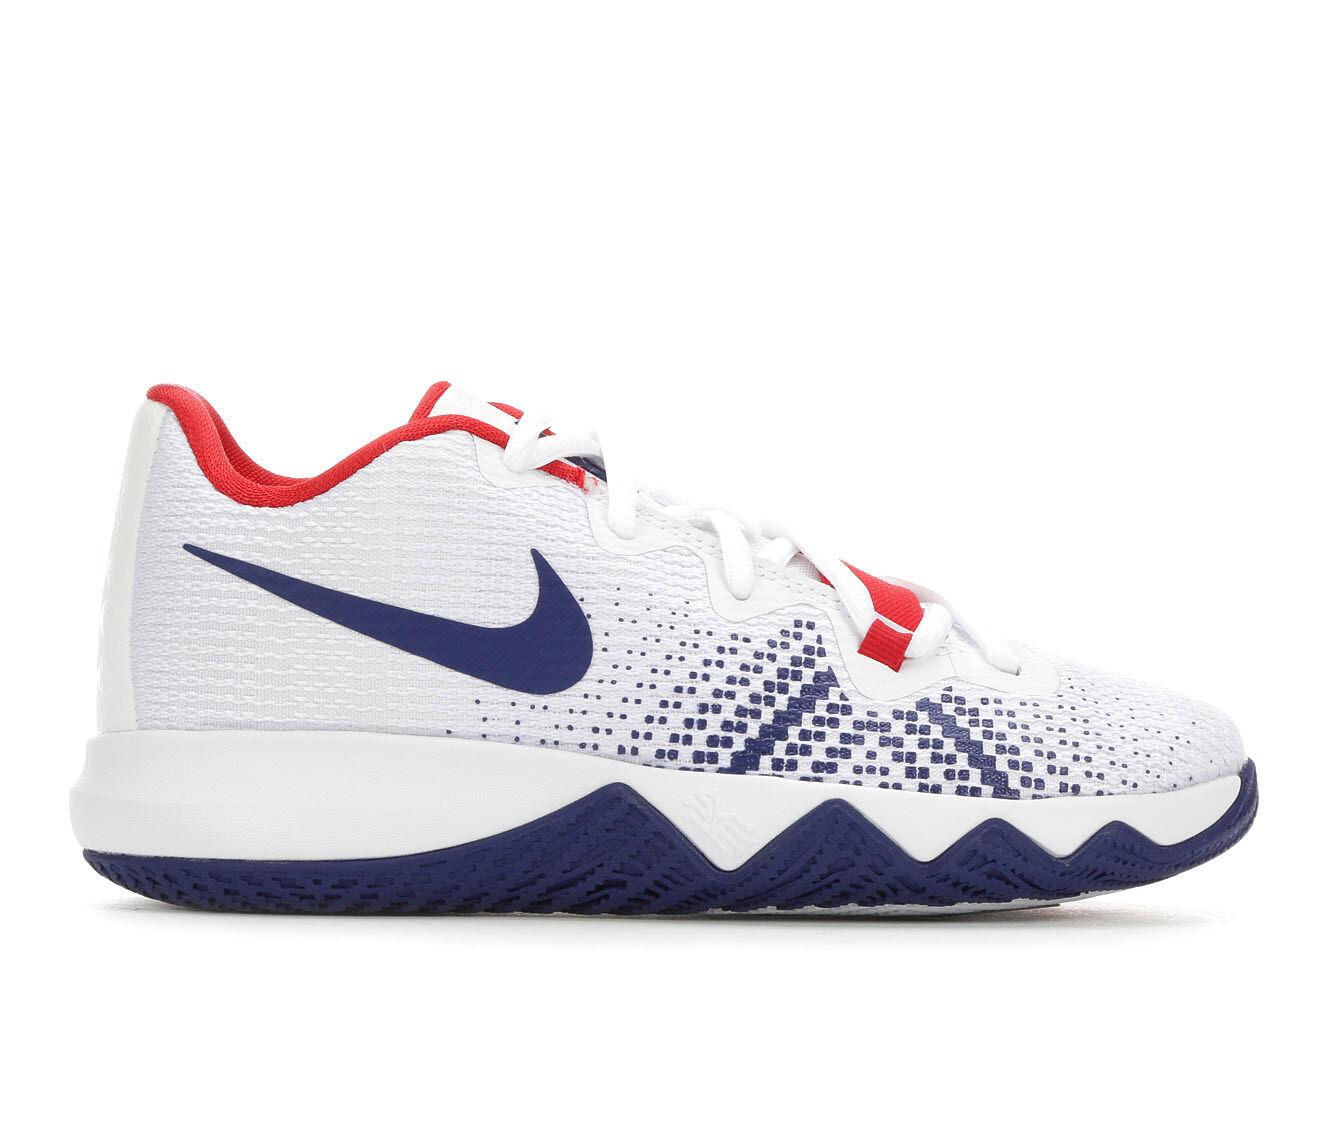 bf183ef4b746 ... get boys nike little kid kyrie flytrap high top basketball shoes shoe  2f663 77740